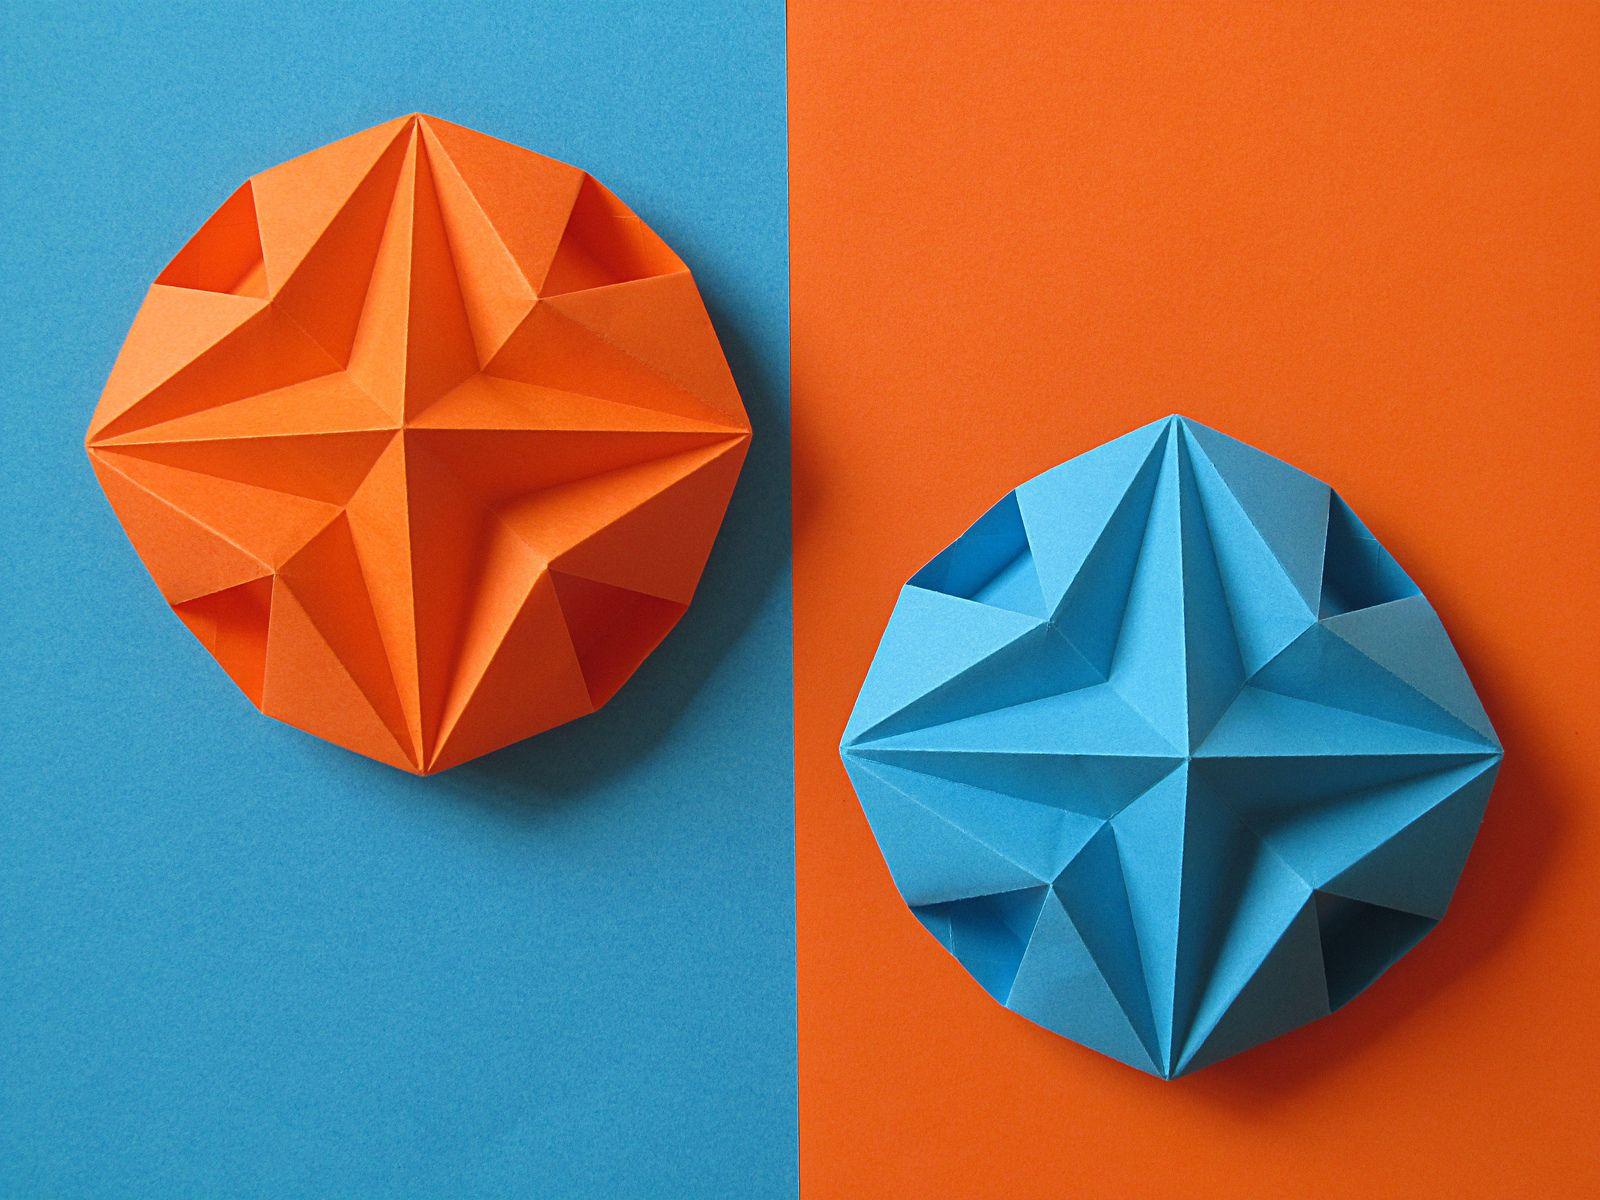 Stella Dodecagonale Dodecagonal Star Origami Wars Diagrams And Crease Patterns Starwarigami